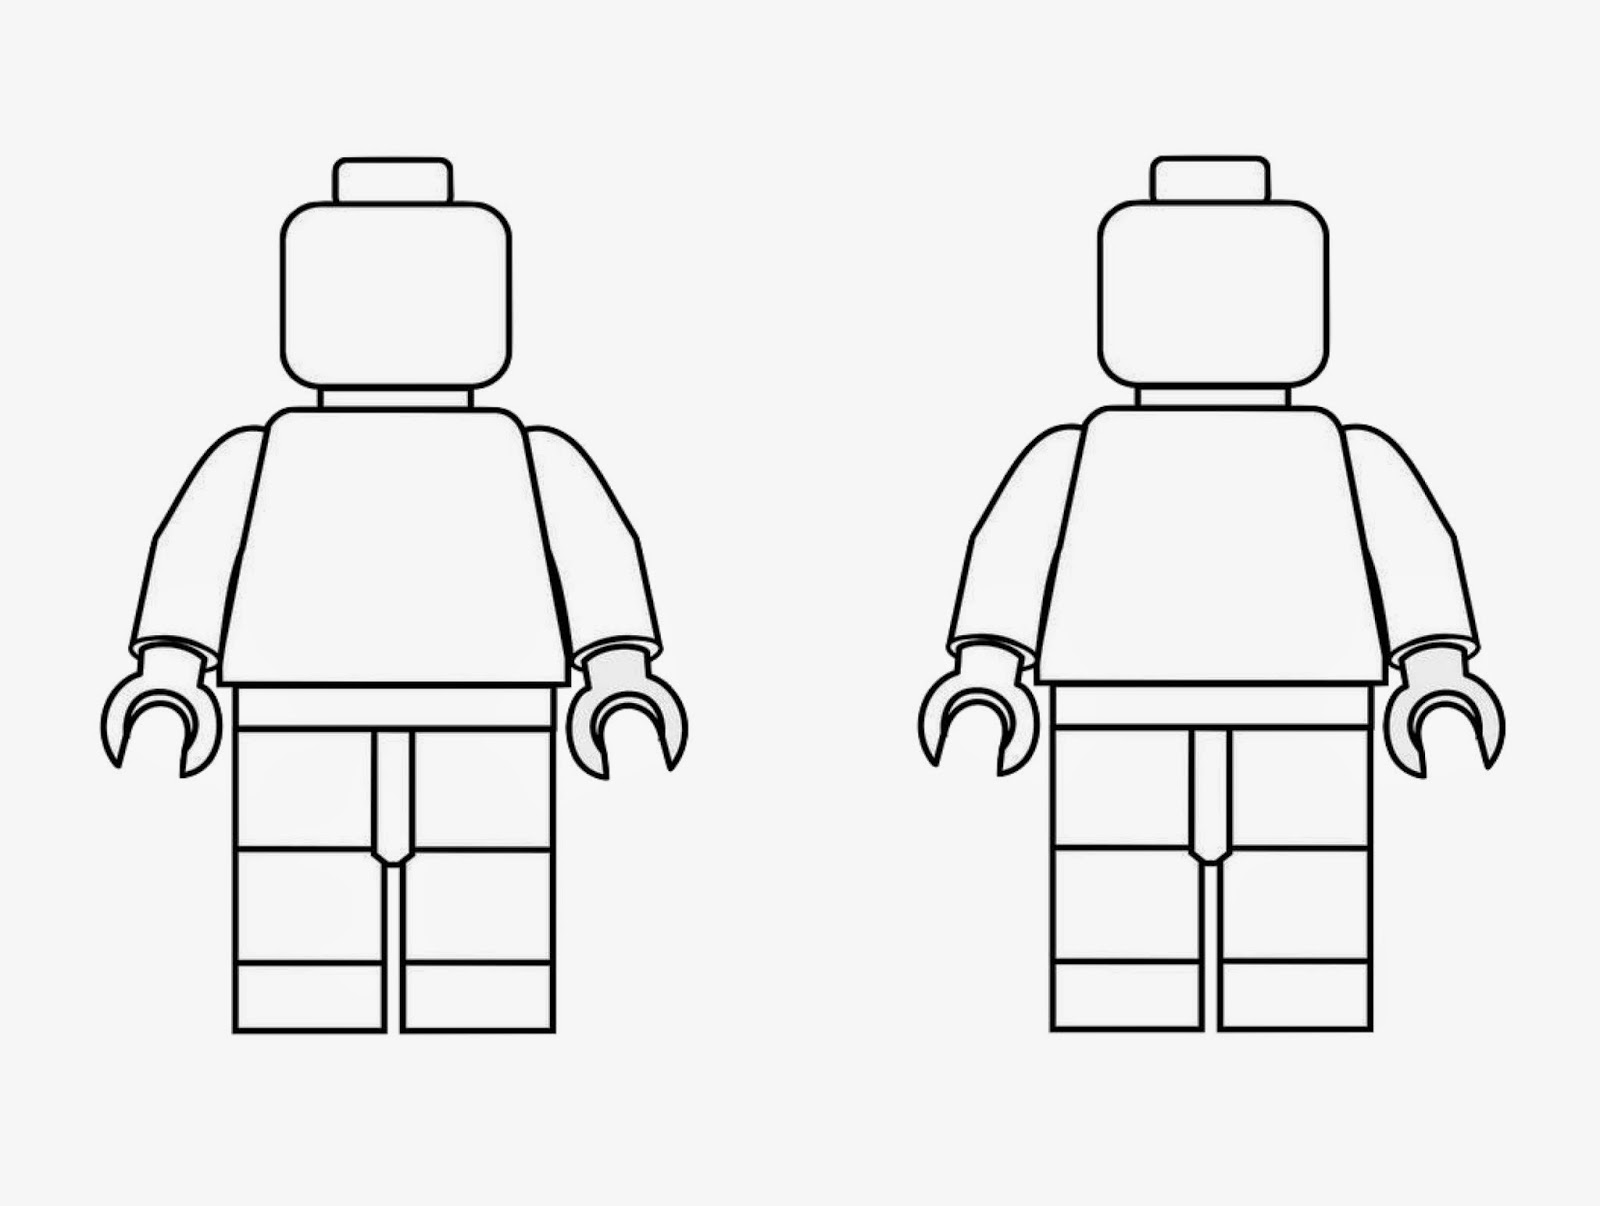 Lego men coloring page